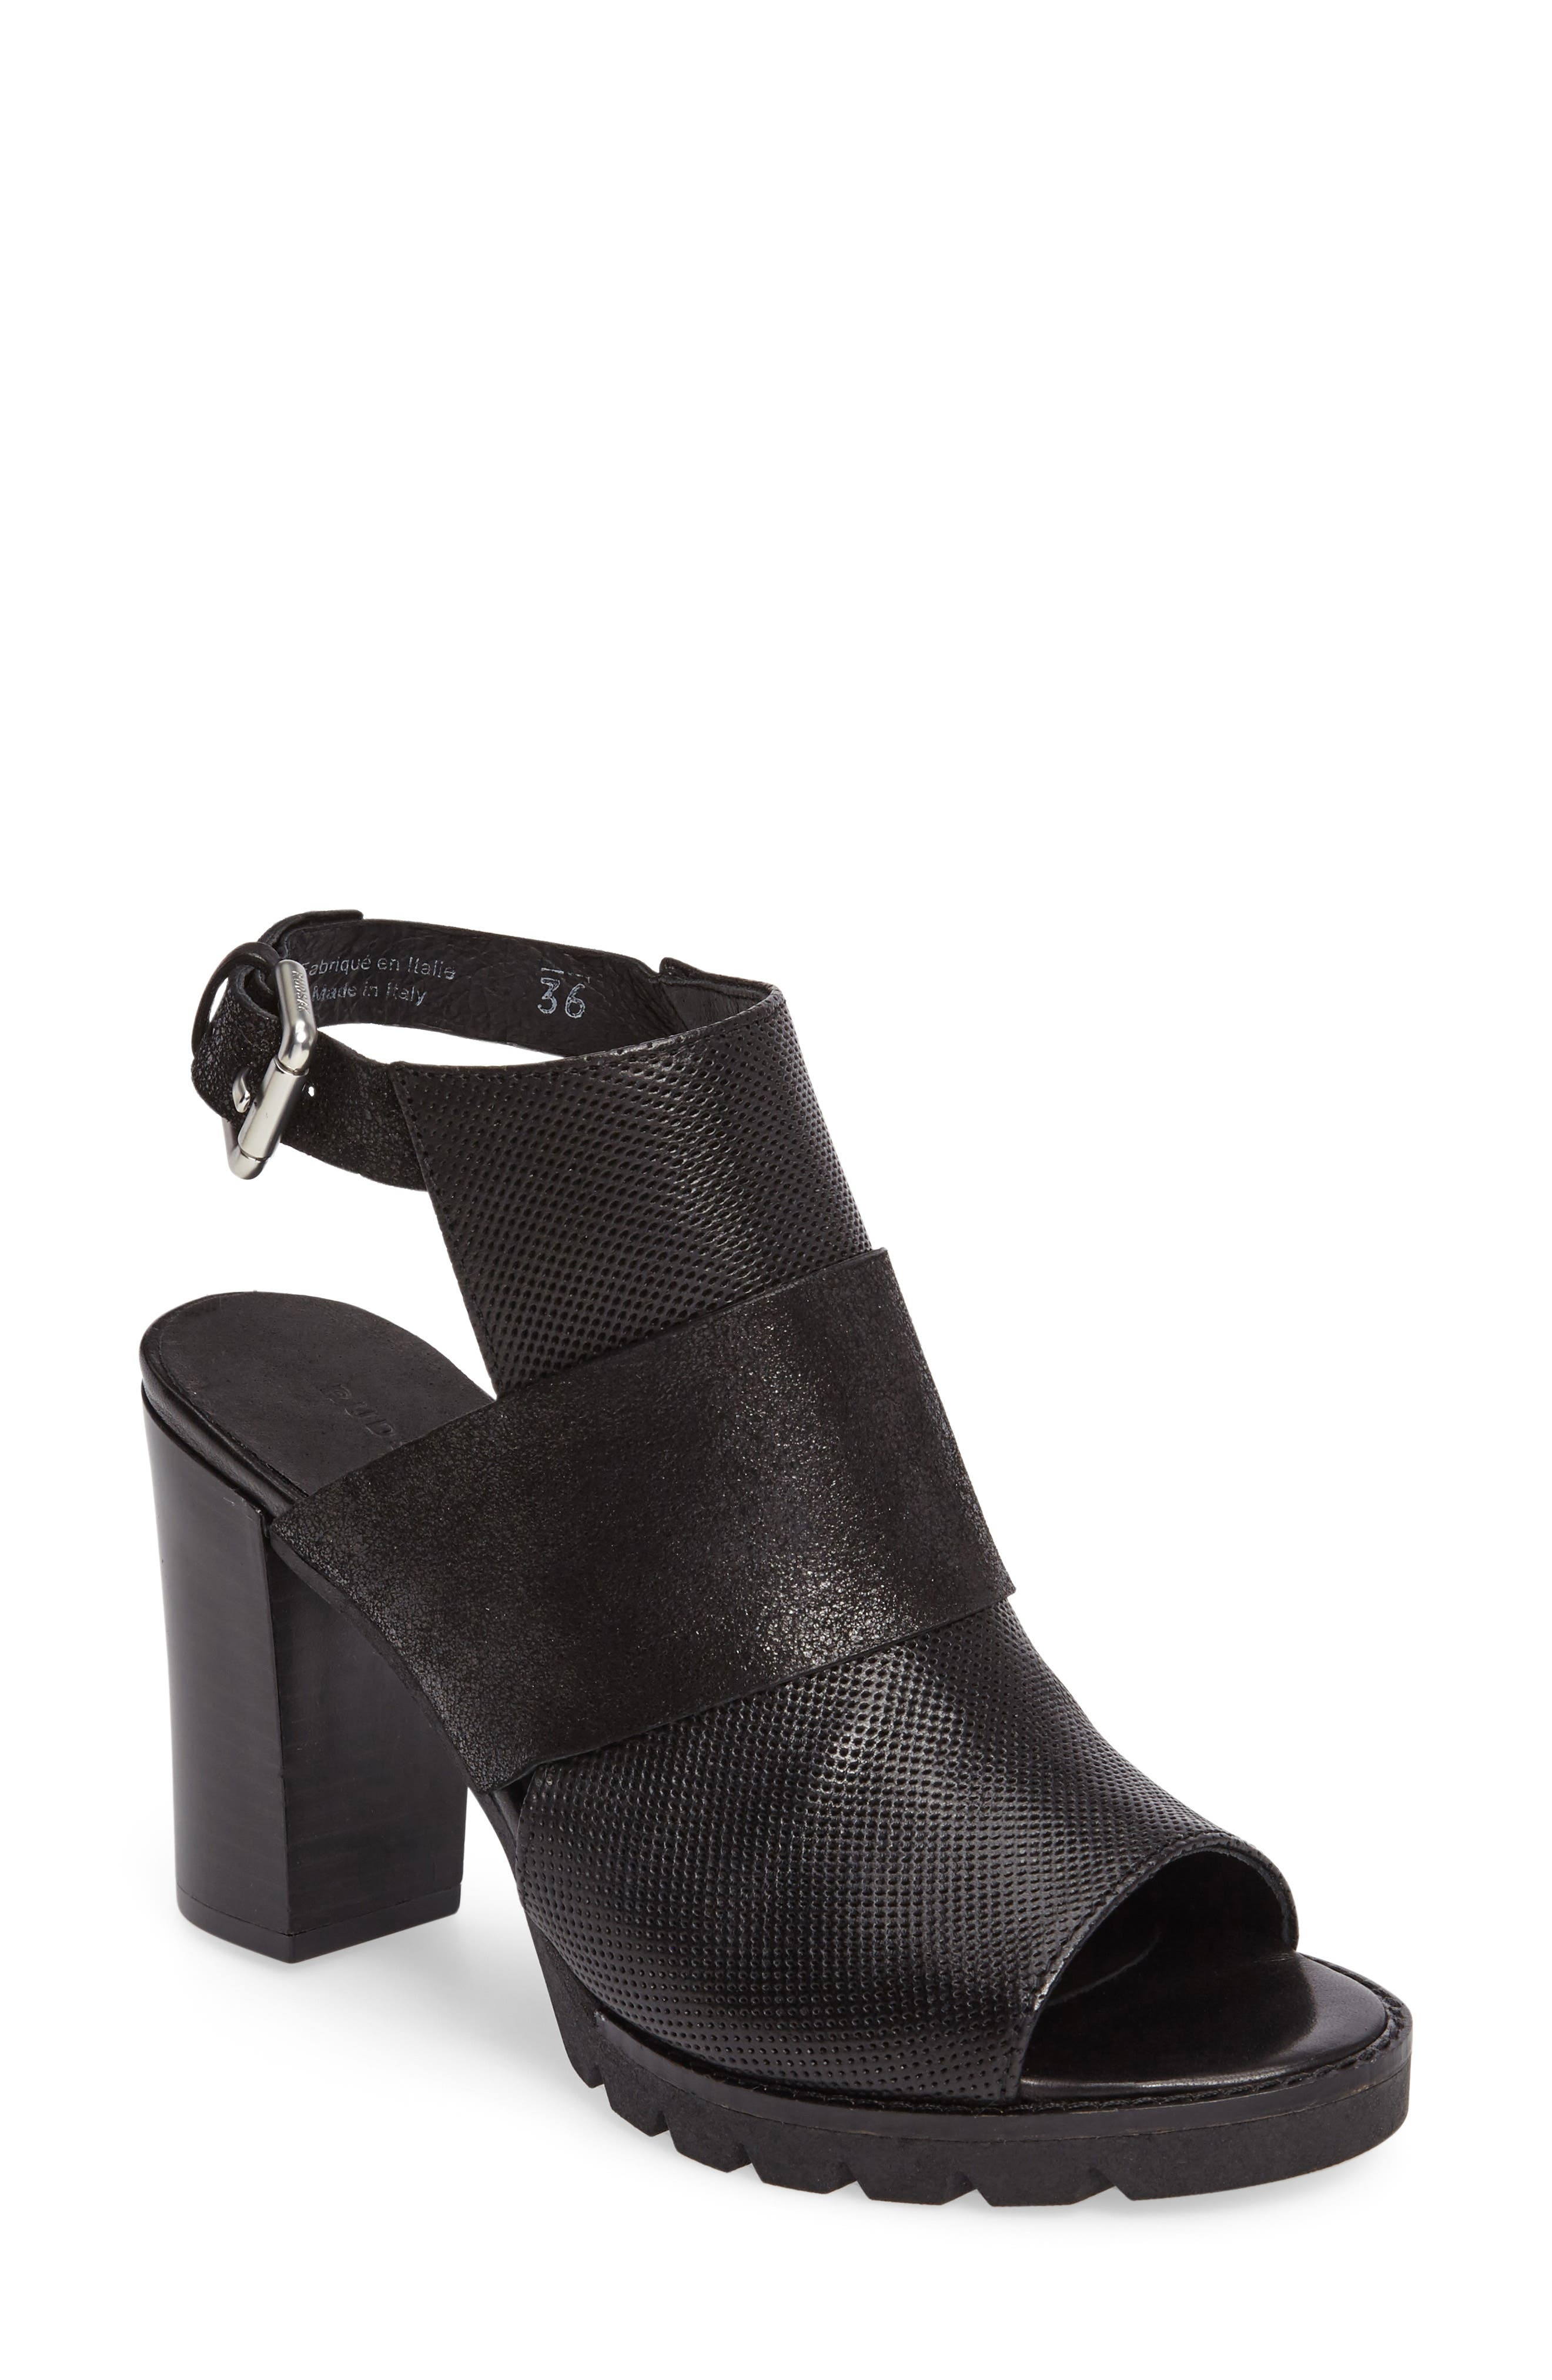 Brittni Block Heel Sandal,                         Main,                         color, 001